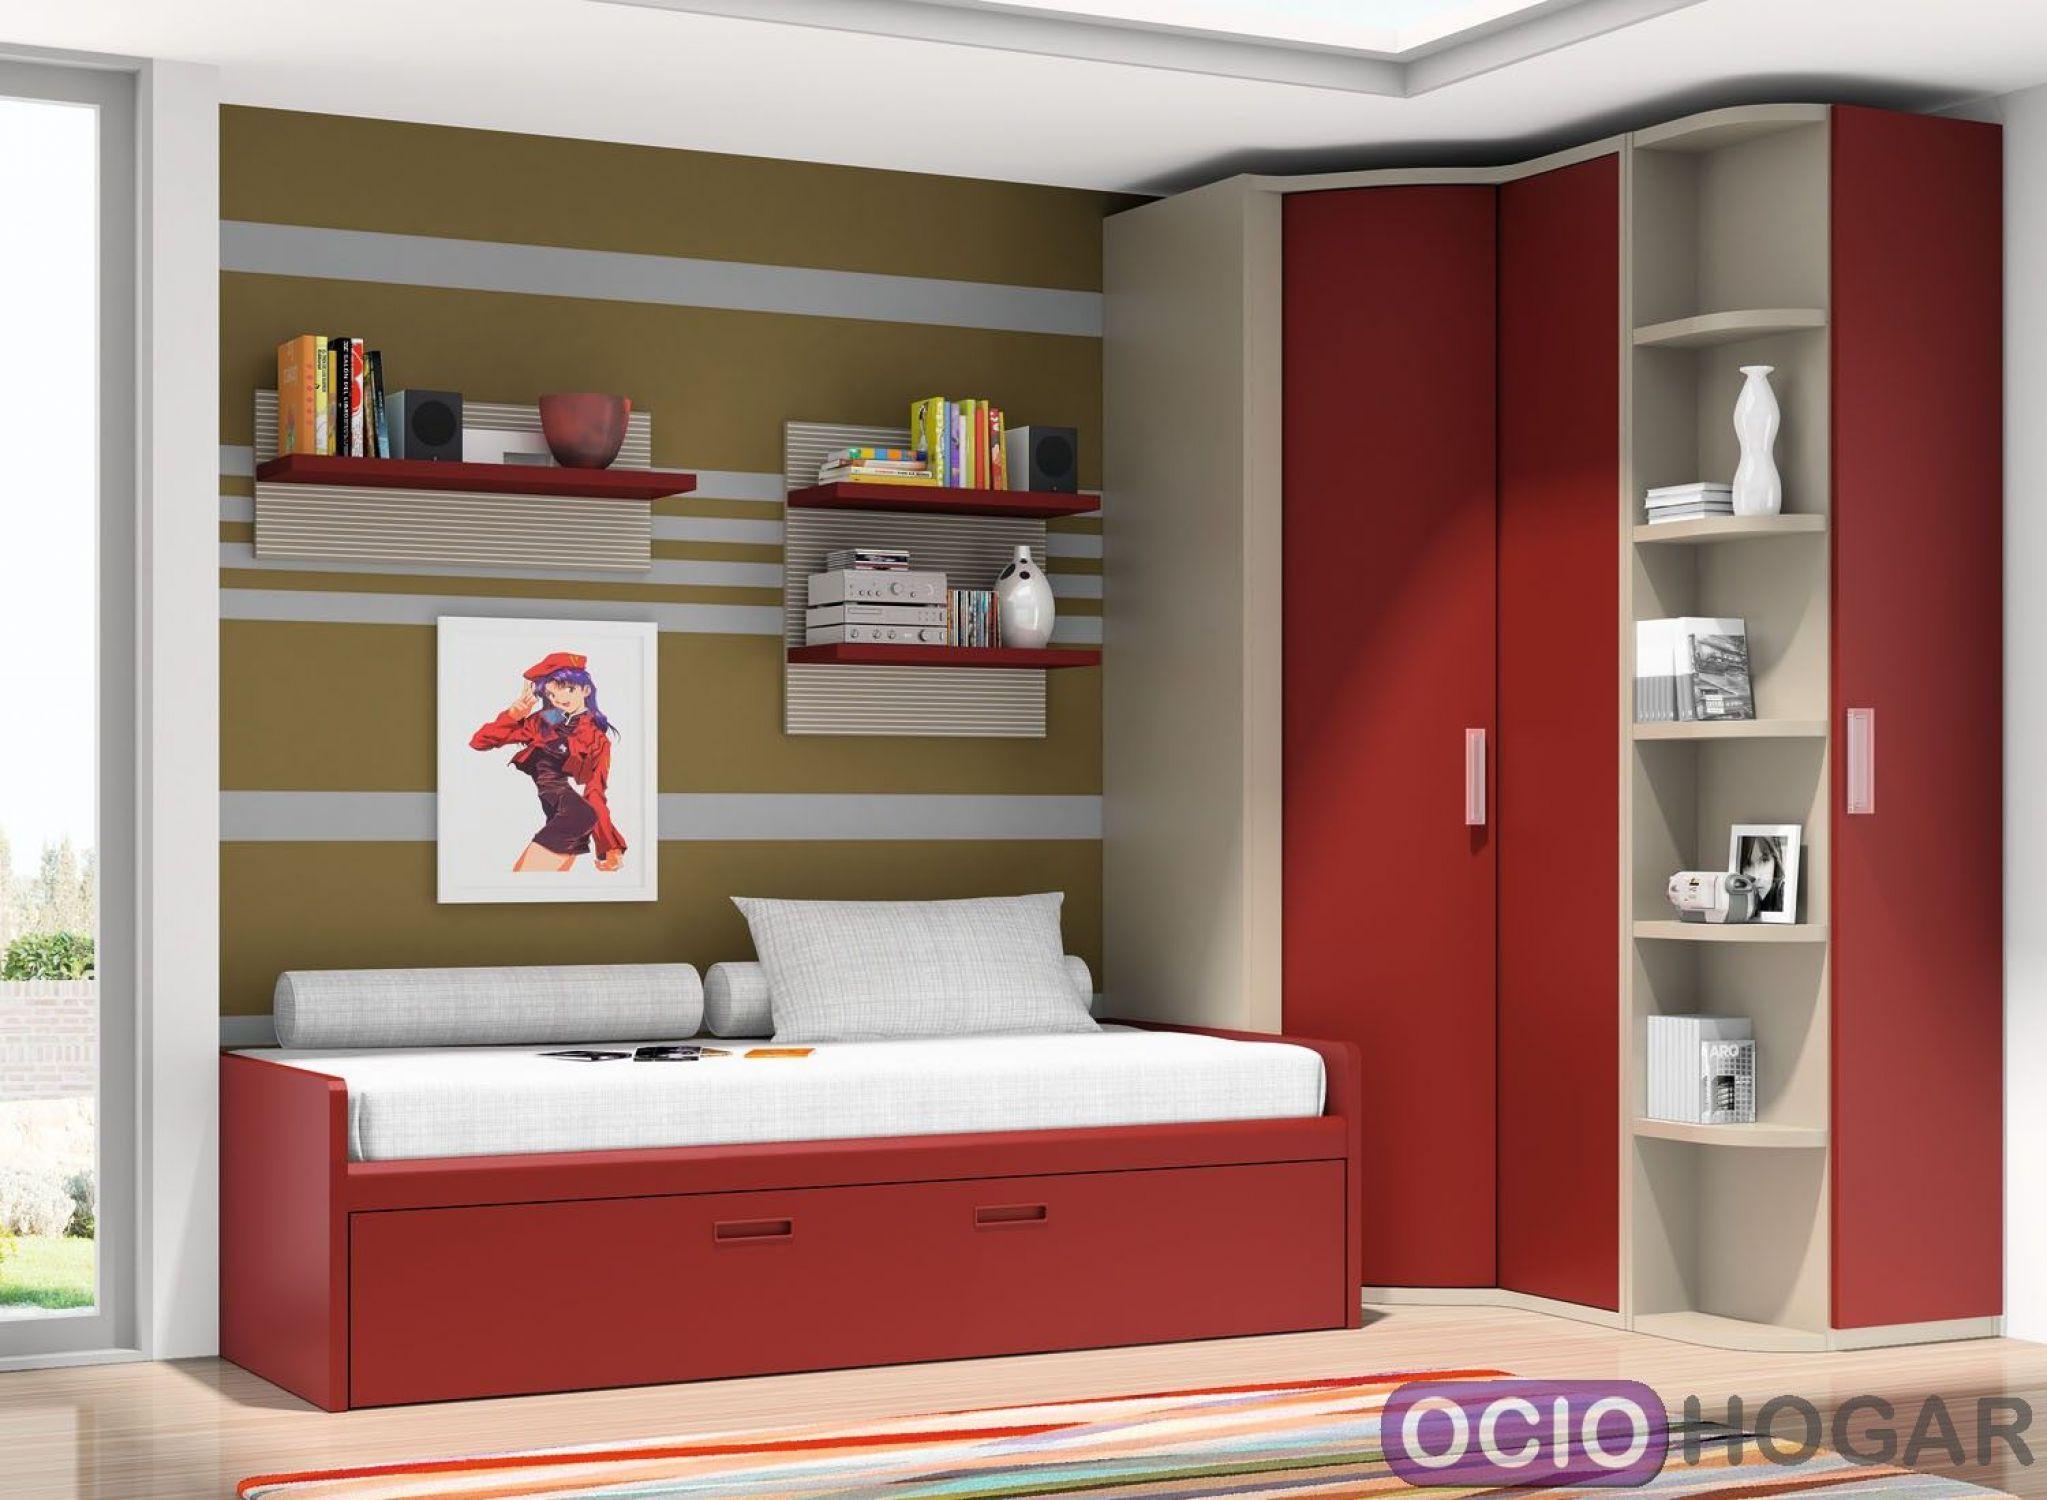 Dormitorio juvenil cabernet dissery muebles juveniles - Cuadros dormitorio juvenil ...